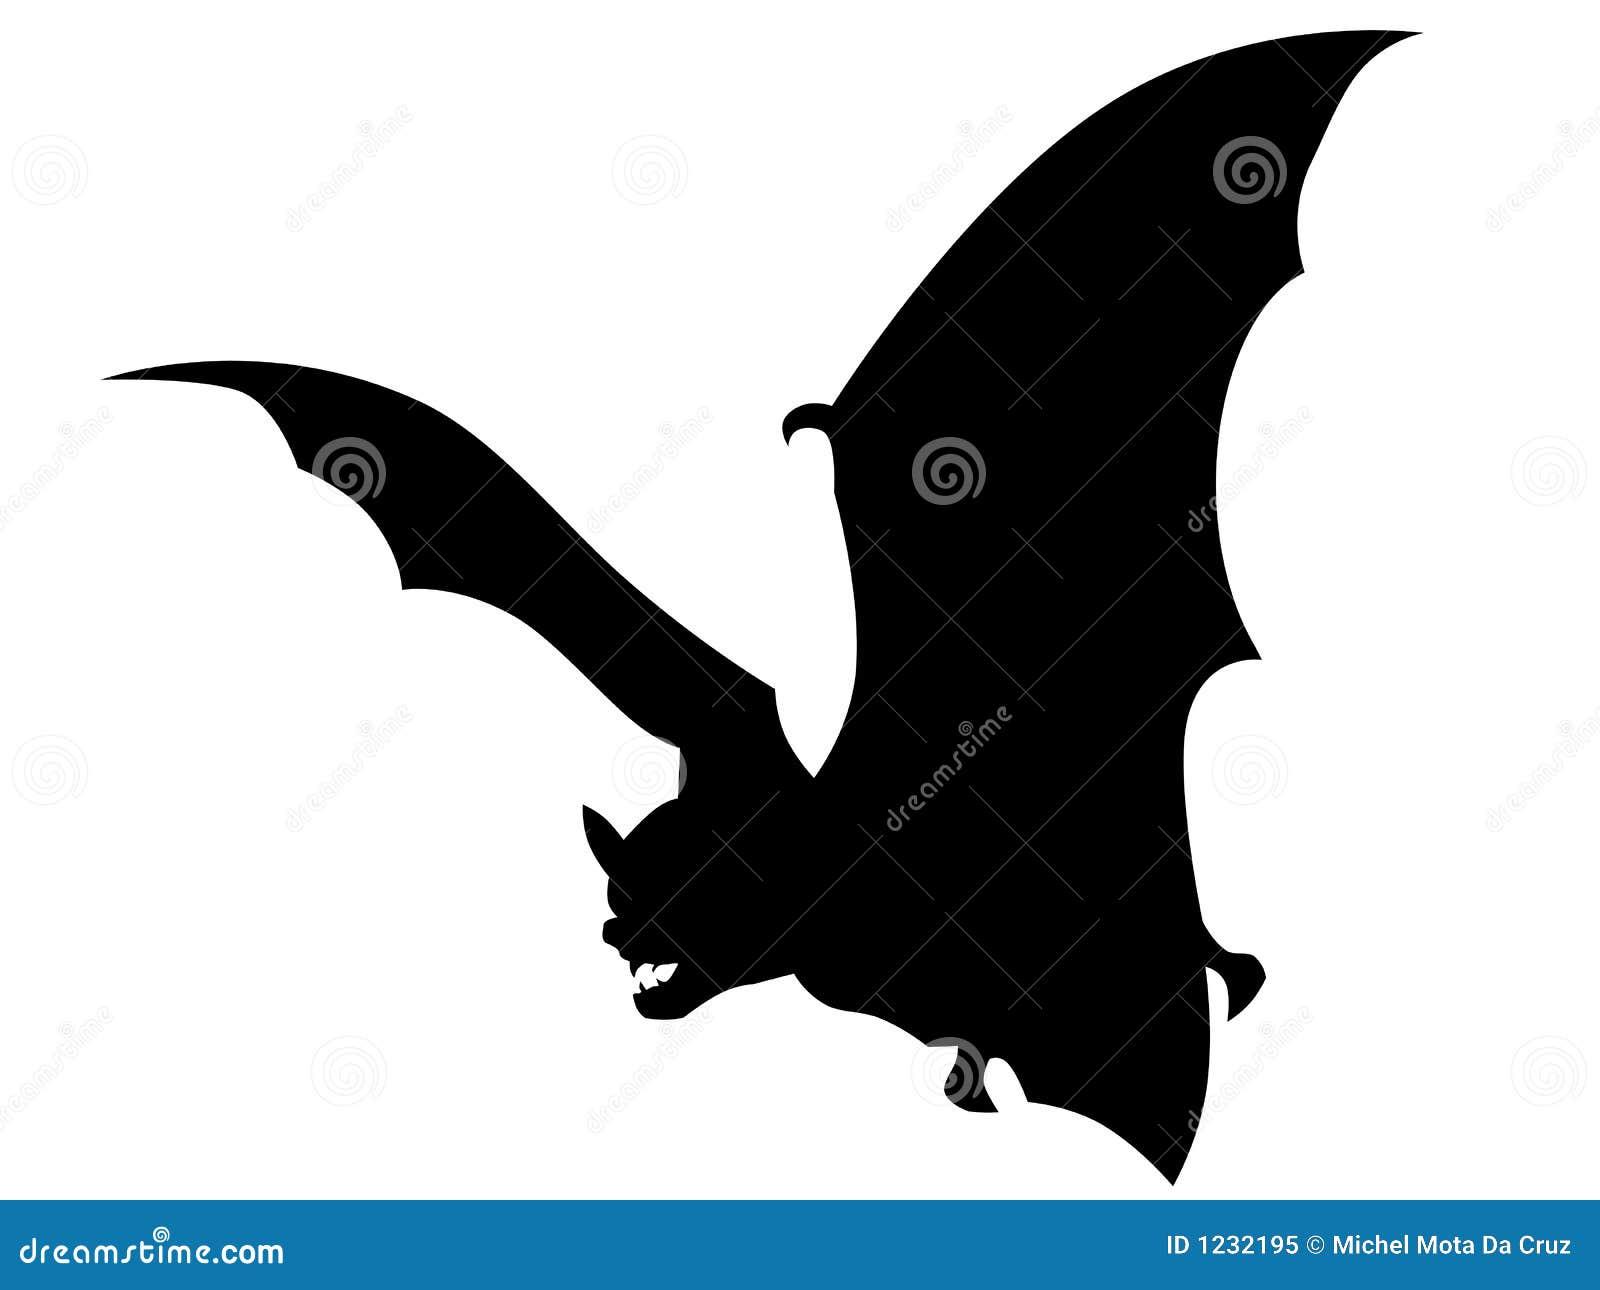 Vampire Bat Vector Royalty Free Stock Photo - Image: 1232195